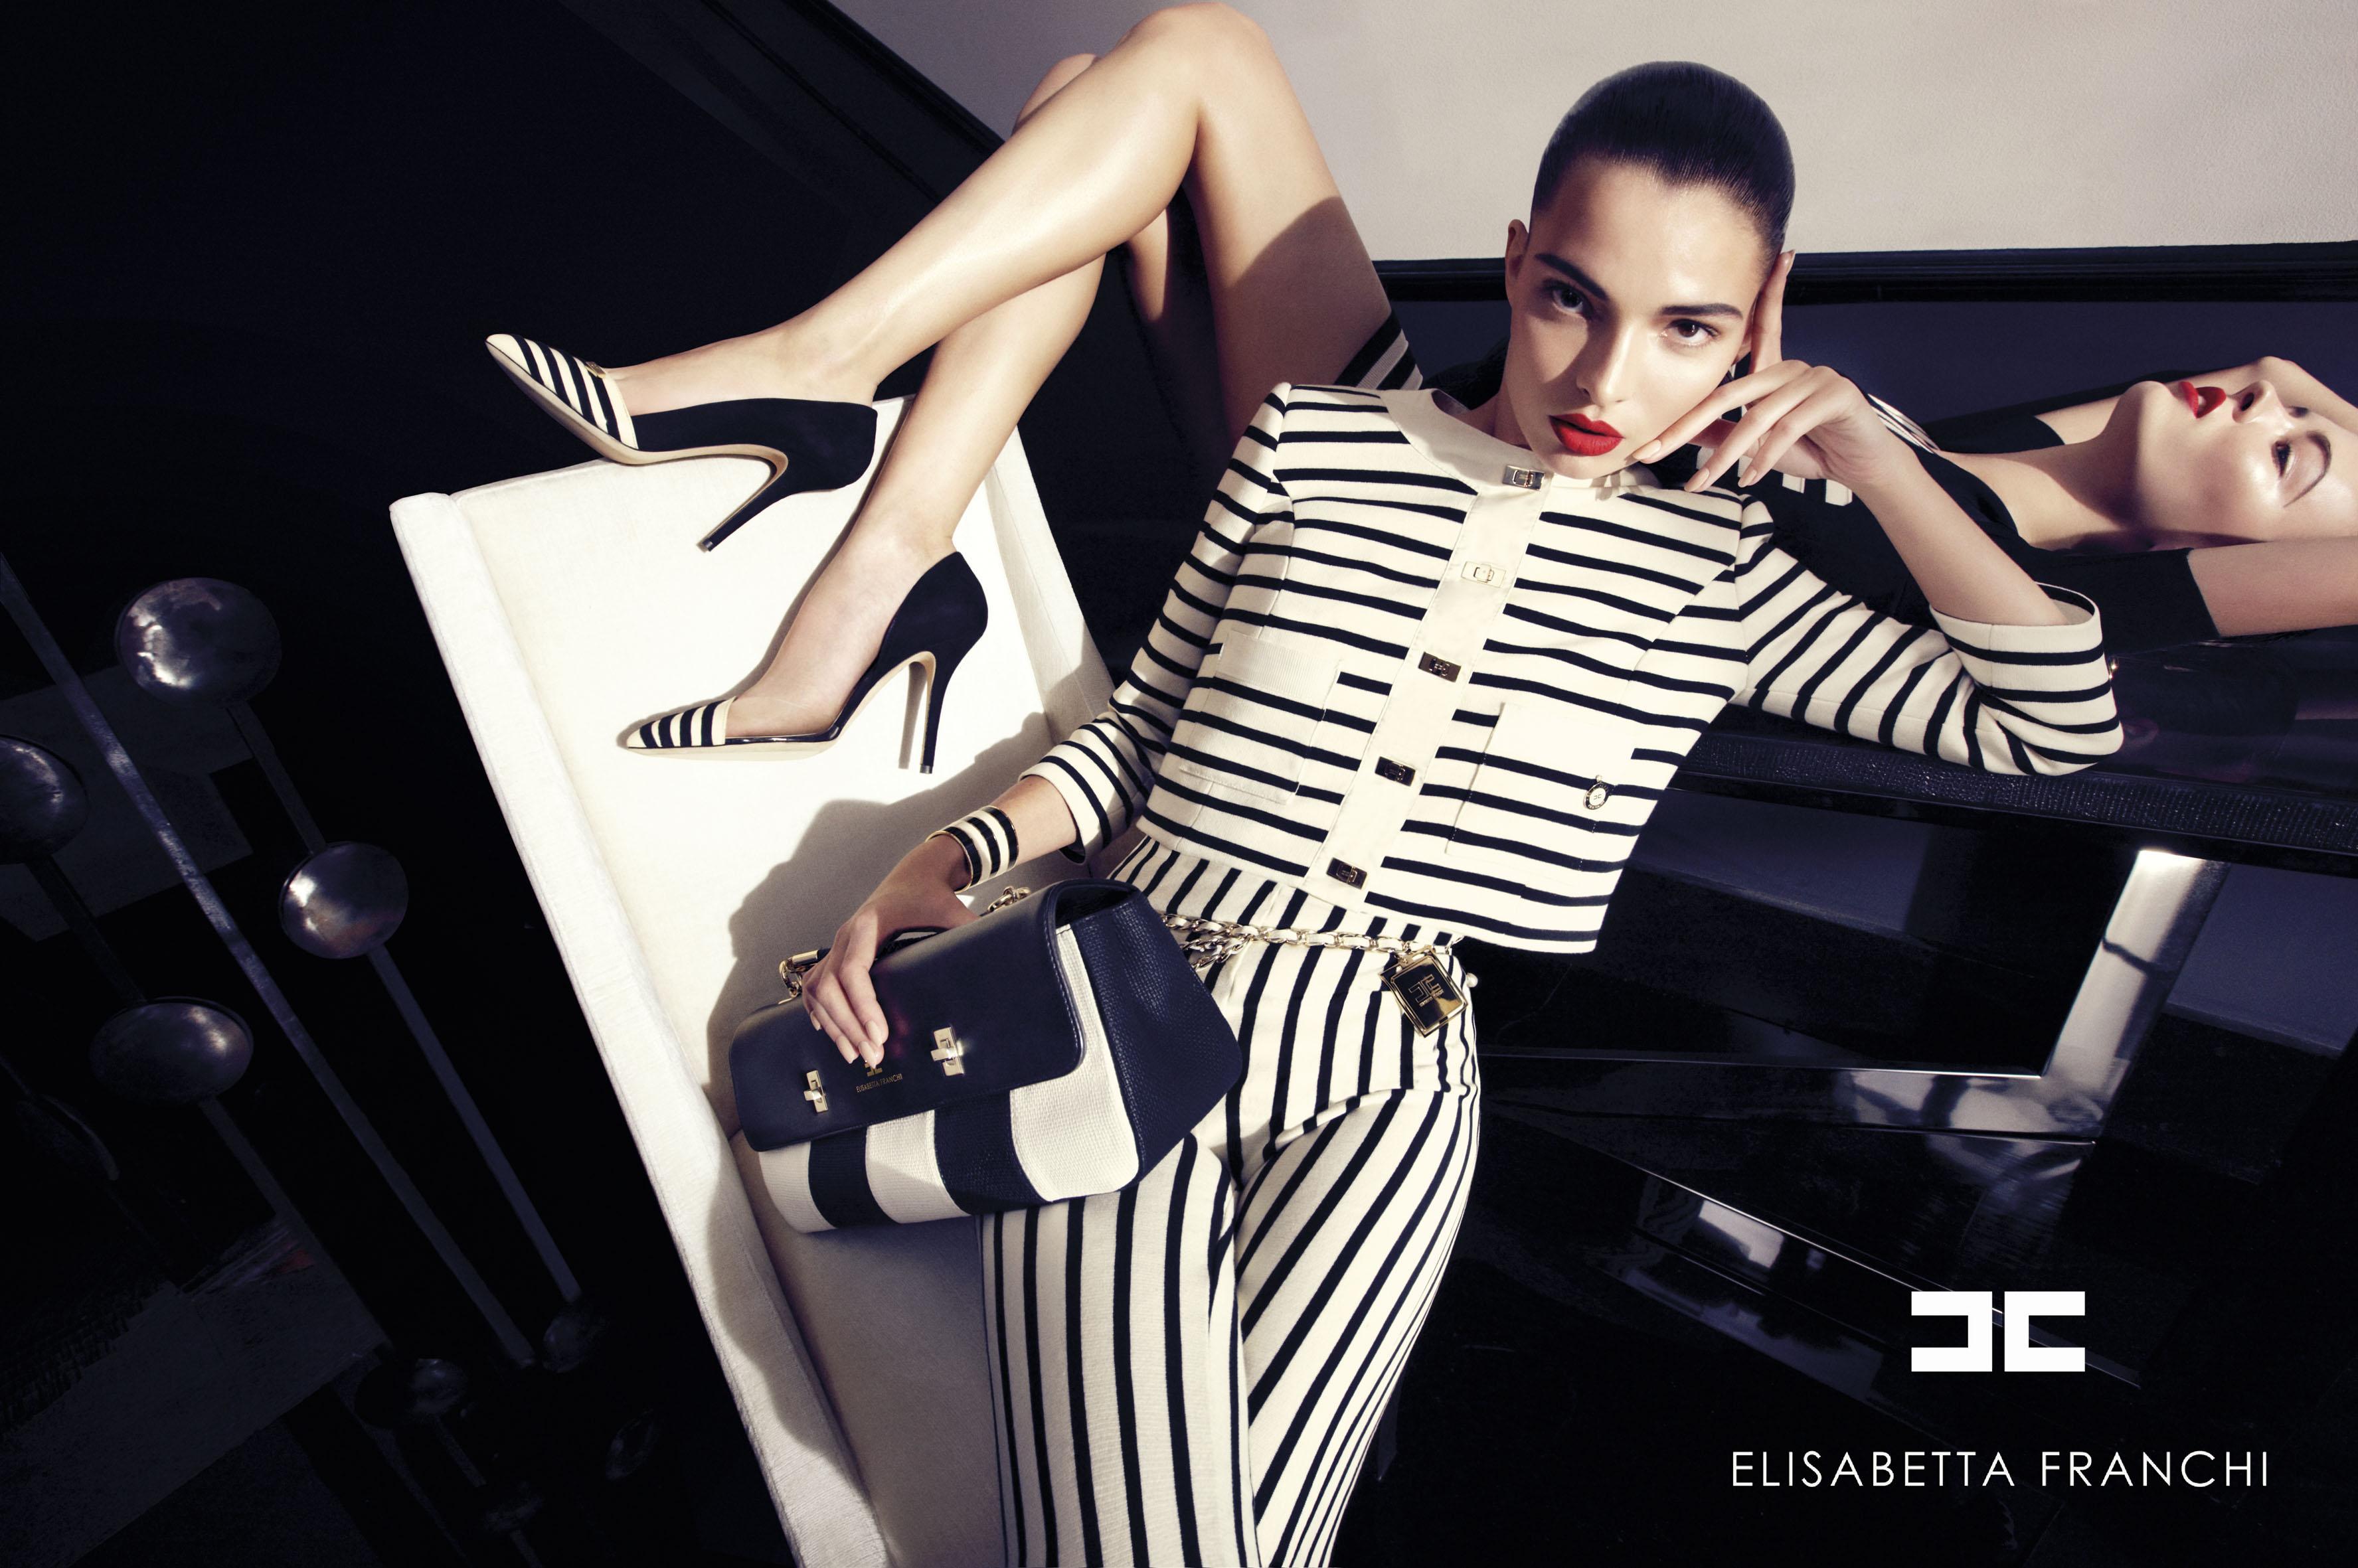 Elisabetta Franchi SS 2013 | Andoni & Arantxa | Elisabetta Franchi | Numerique Retouch Photo Retouching Studio